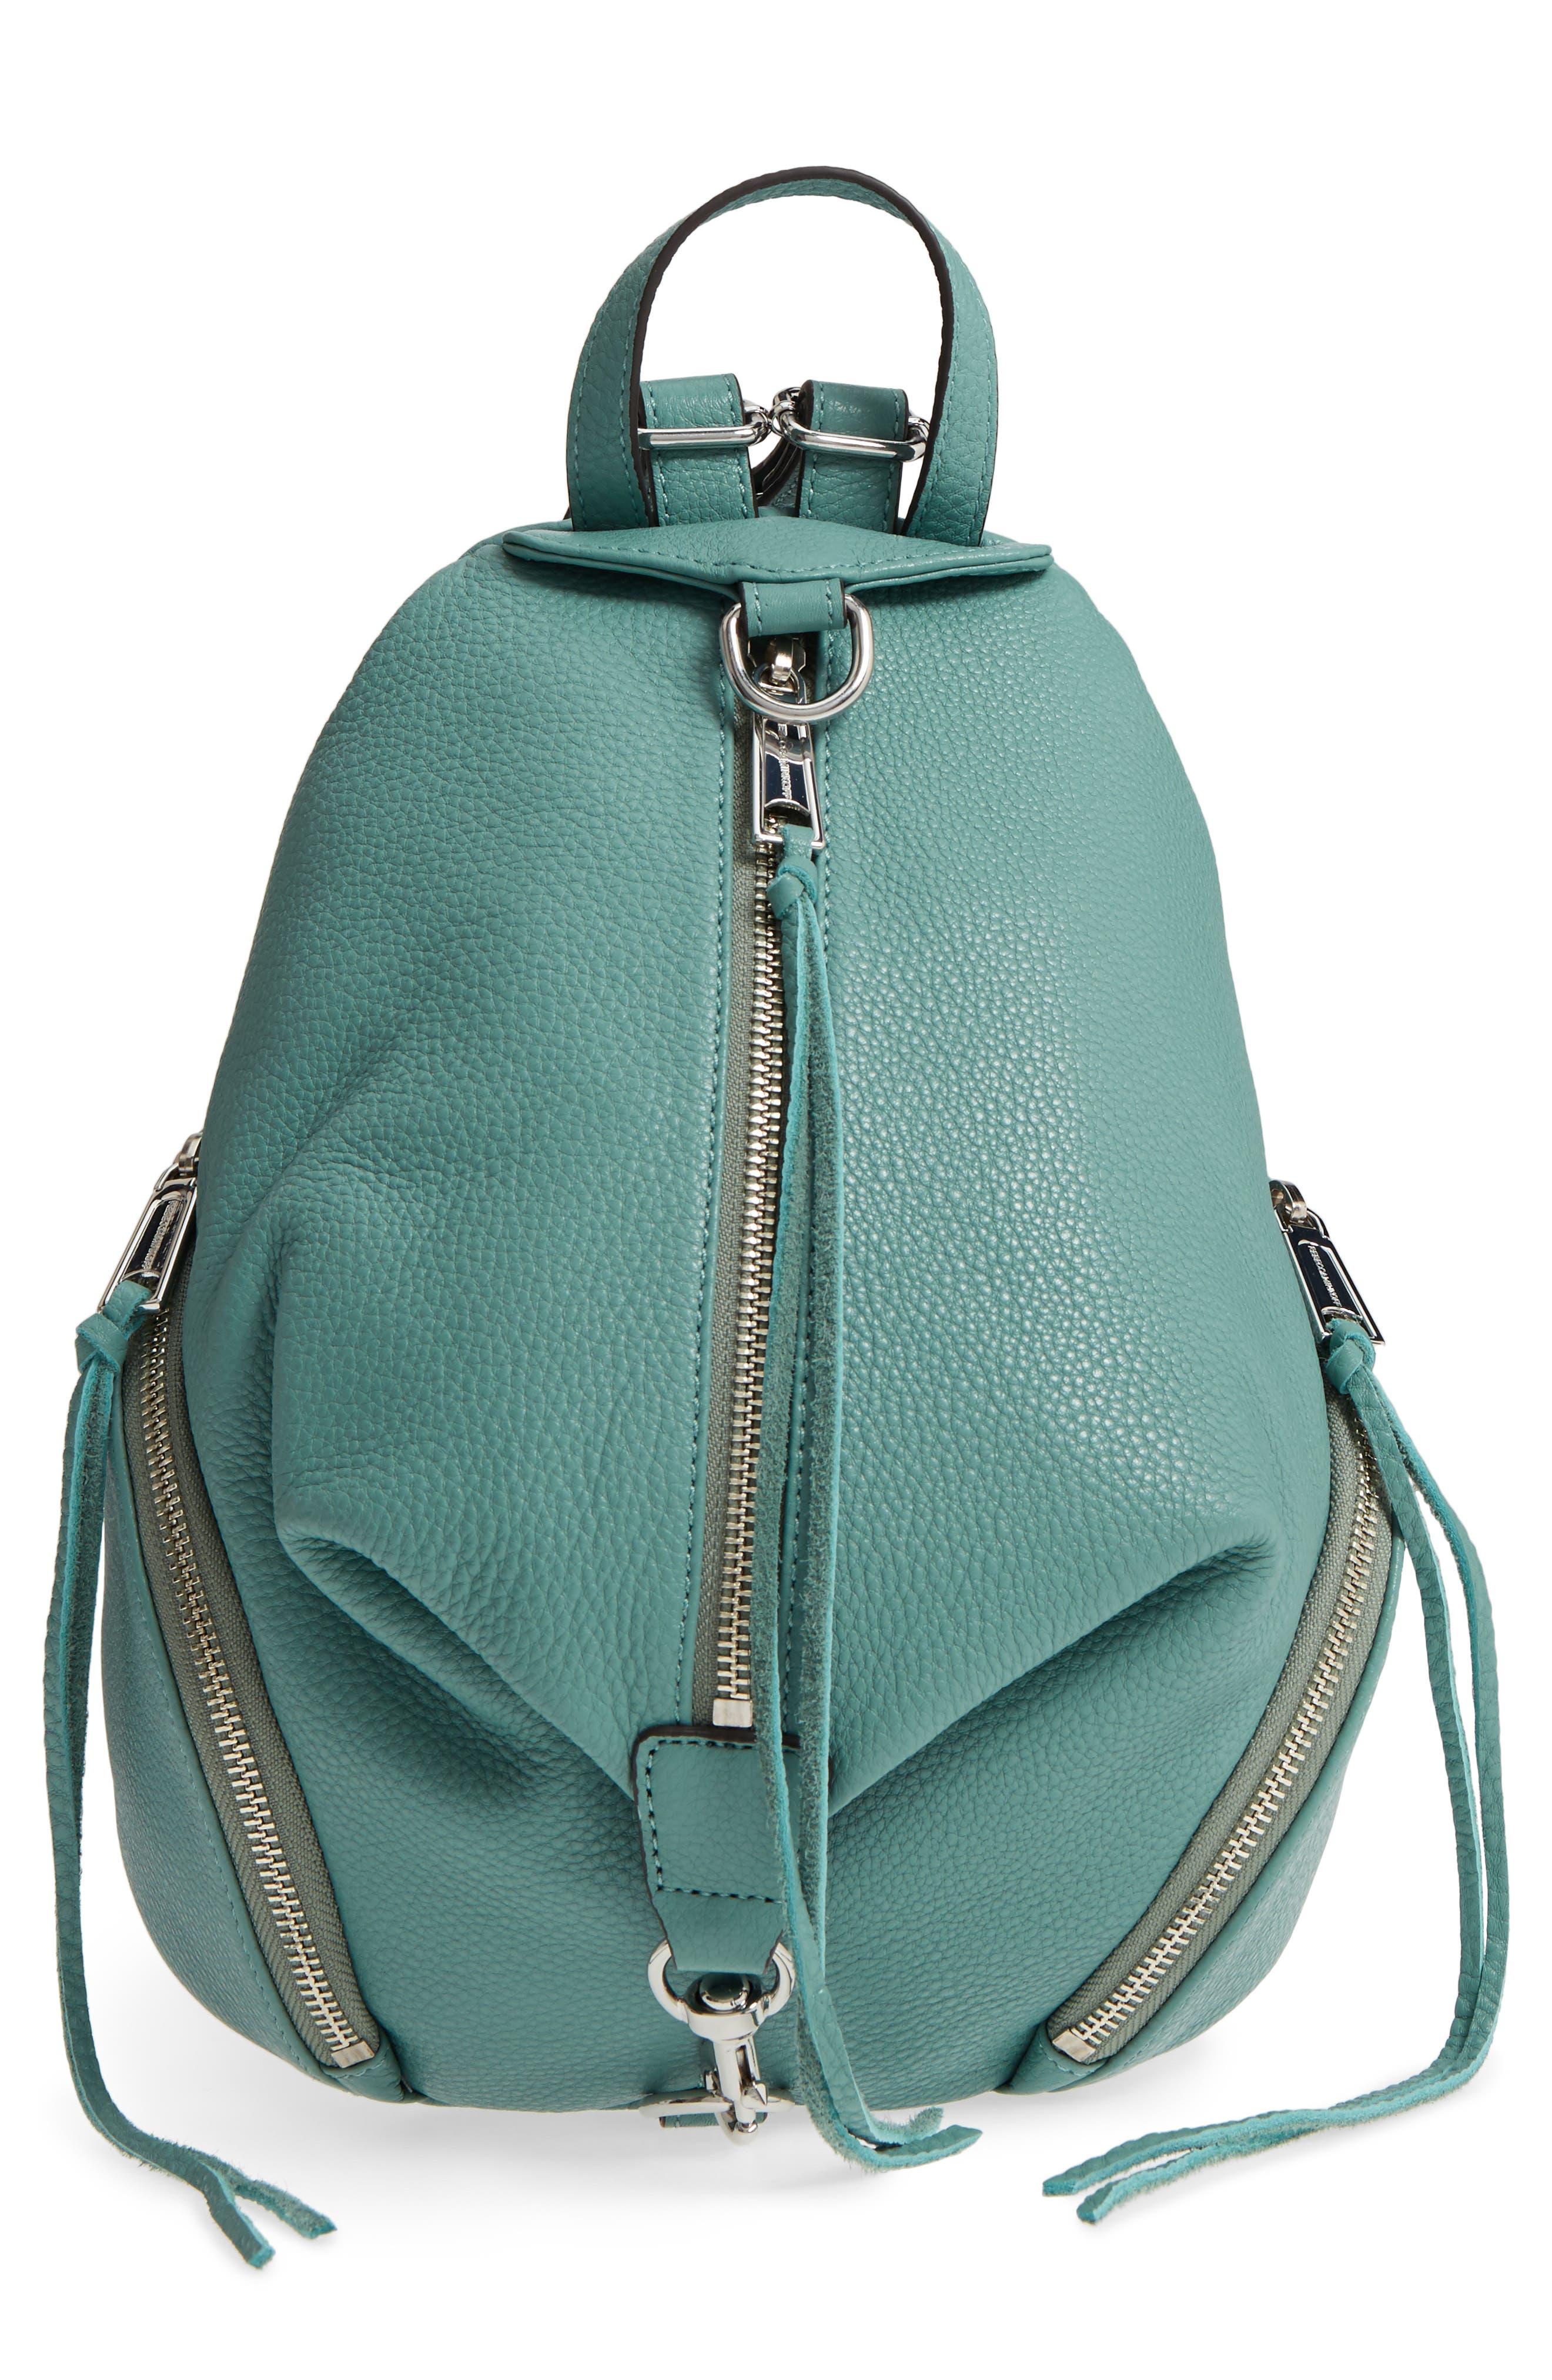 Medium Julian Backpack,                         Main,                         color, Dusty Green